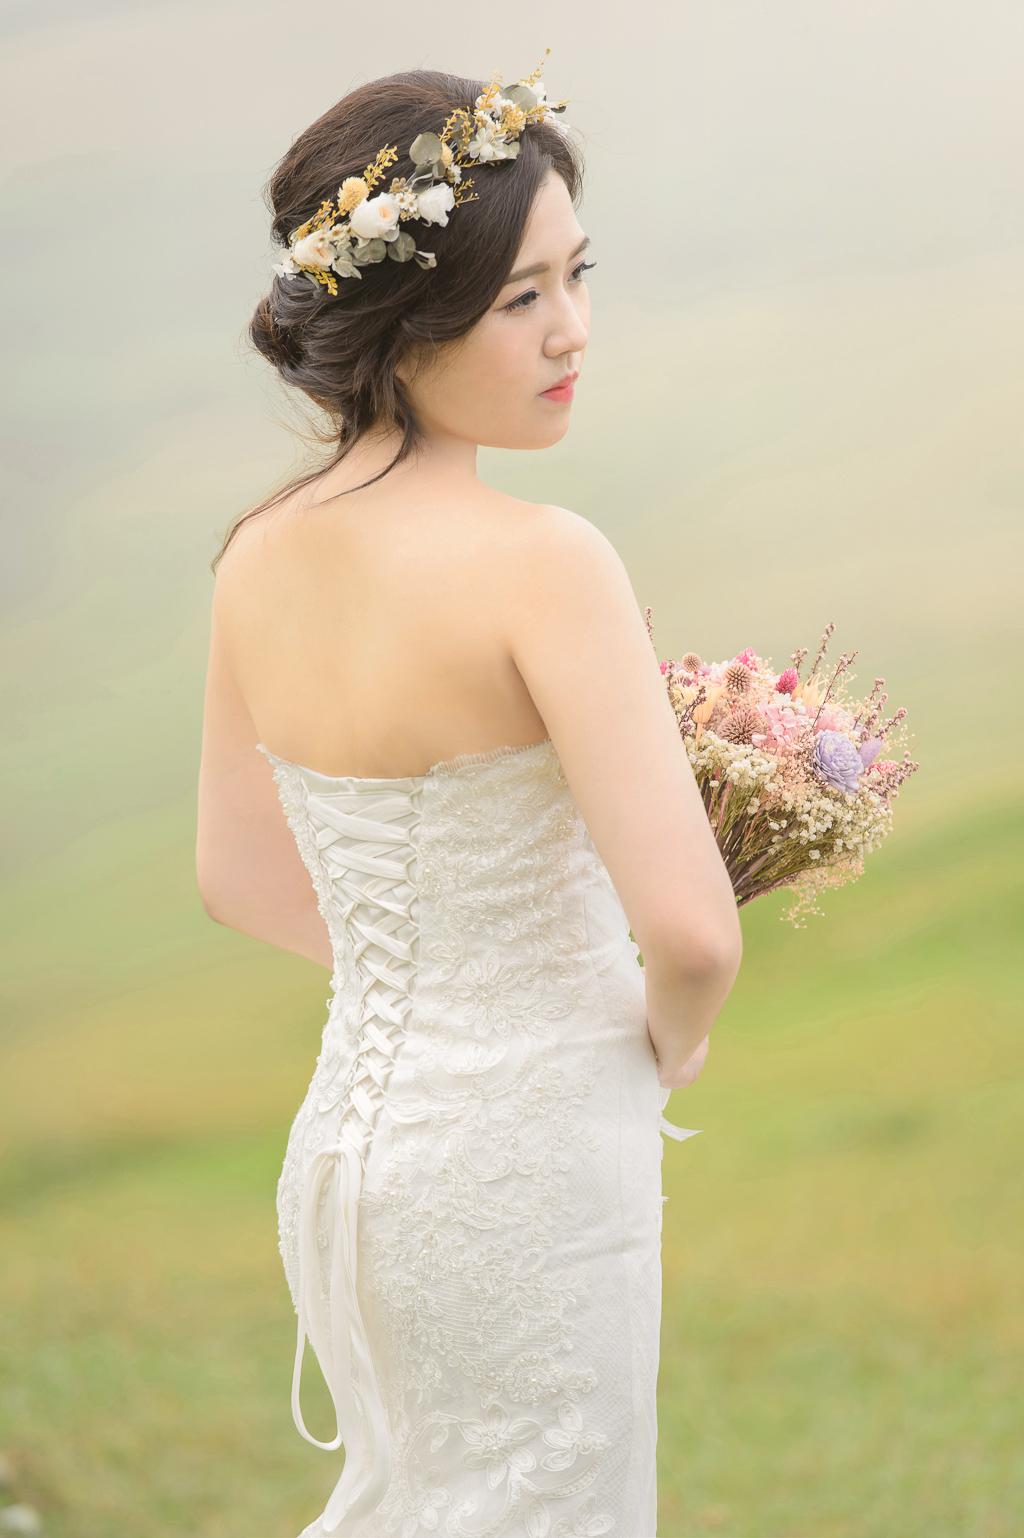 婚攝小勇,小寶團隊, 自助婚紗, even more,wedding day-003